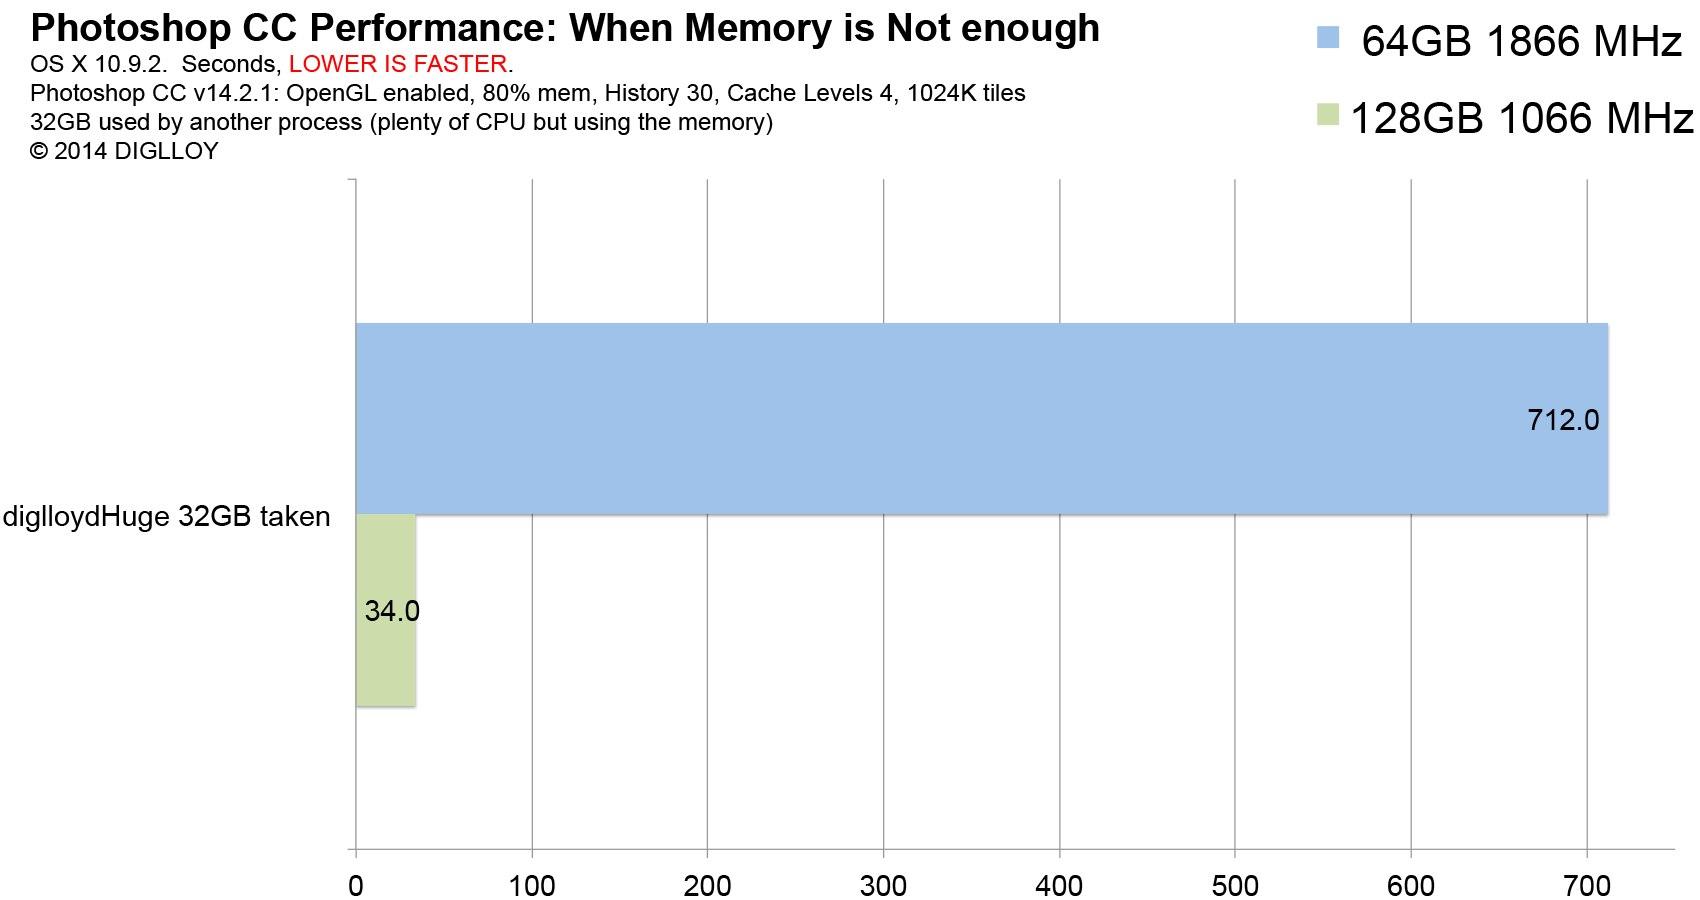 MacPro-Late2013-64GB-vs-128GB-PhotoshopCC-Little-Memory